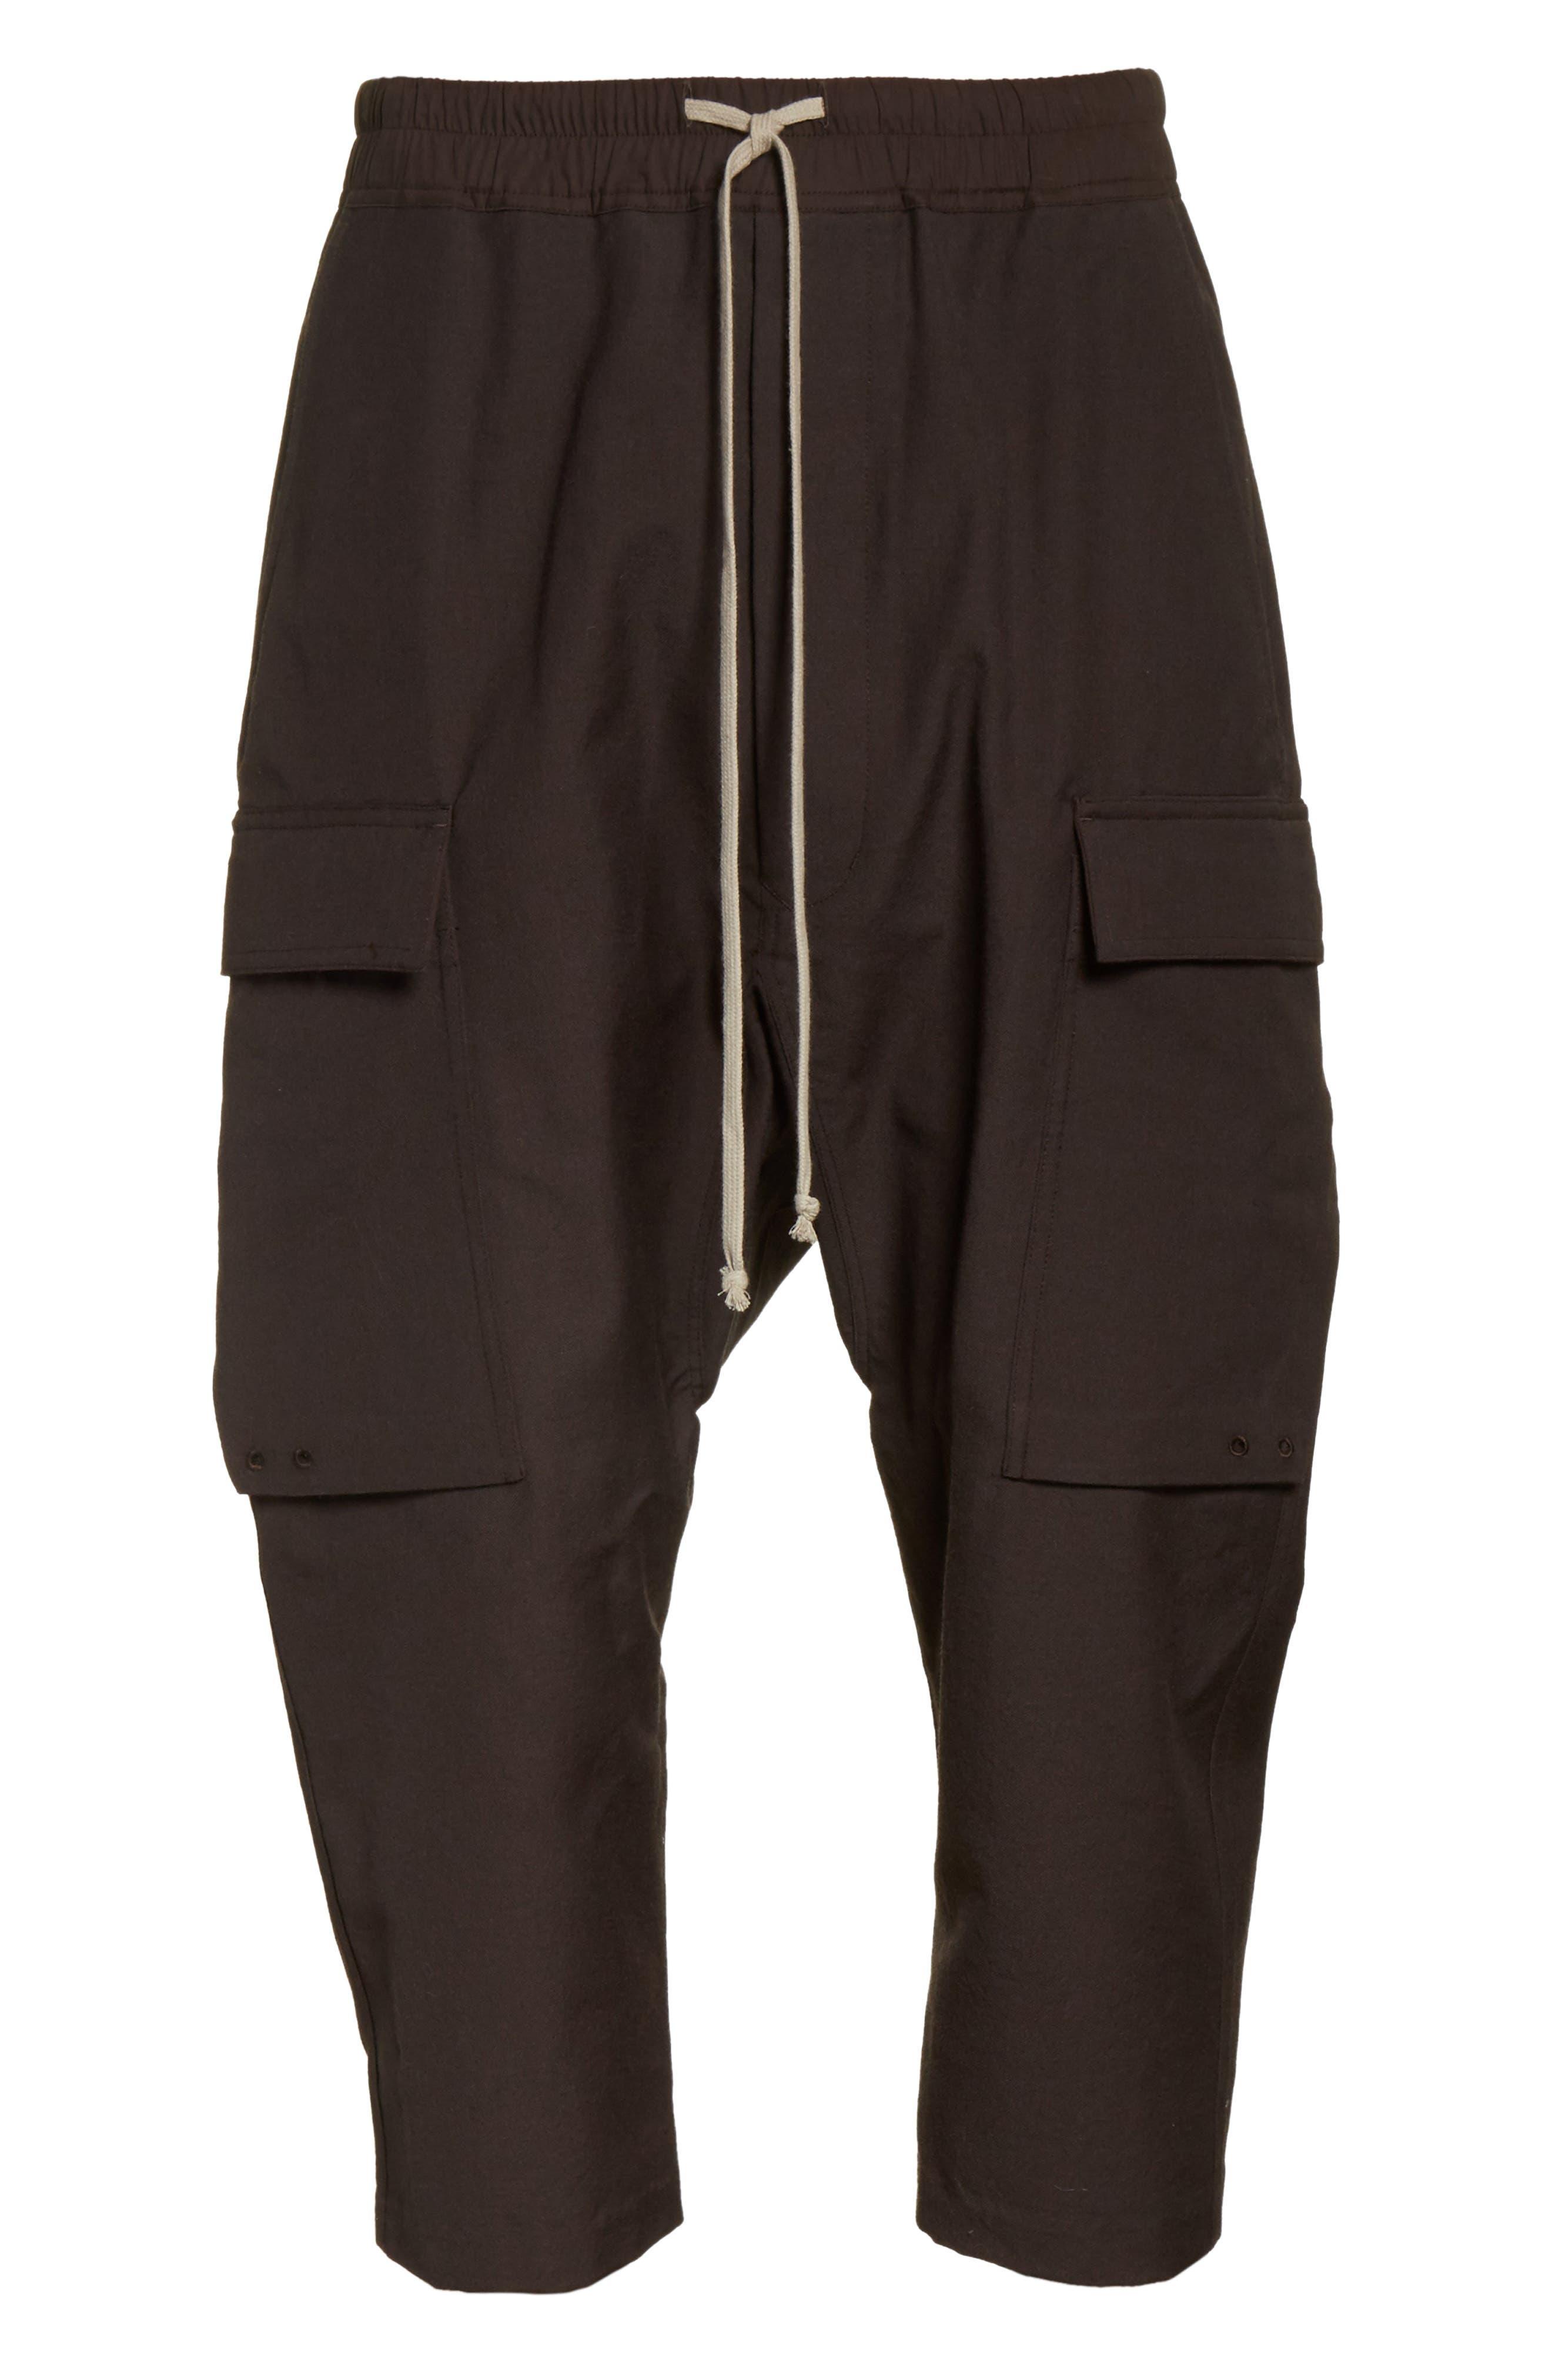 Cropped Drawstring Cargo Pants,                             Alternate thumbnail 6, color,                             Brown